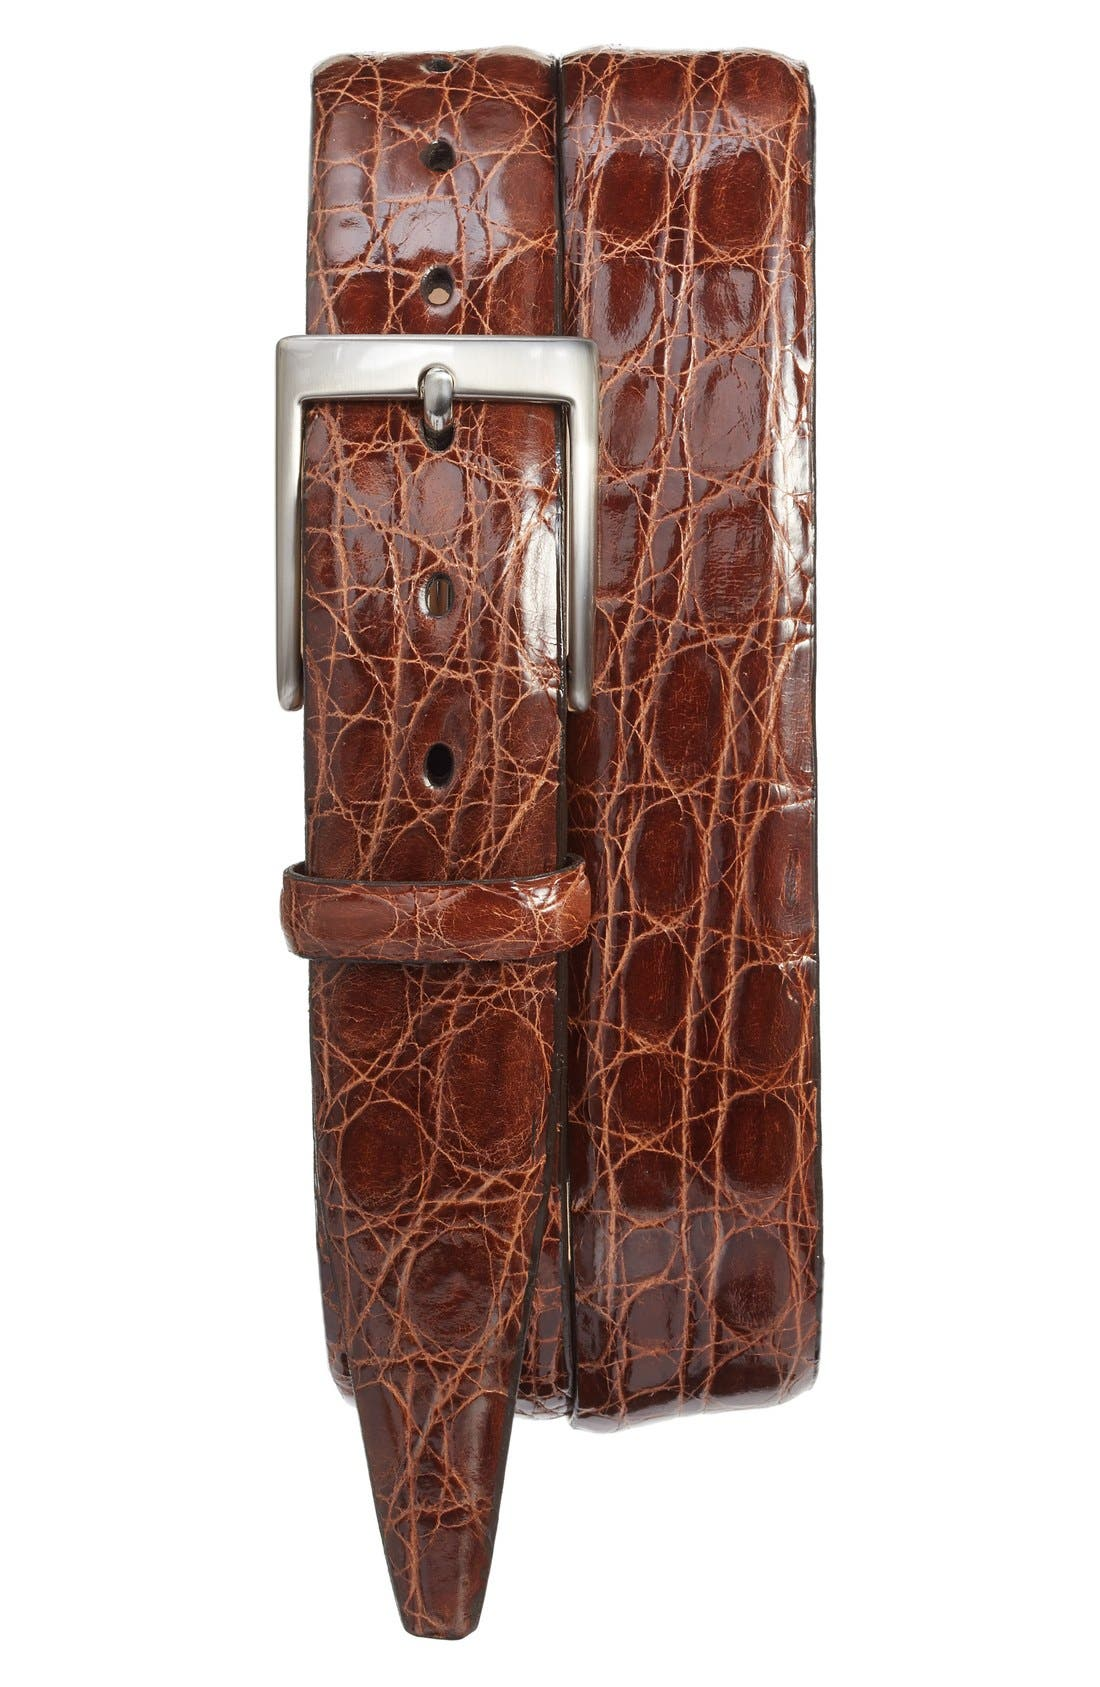 Main Image - Torino Belts Caiman Alligator Leather Belt